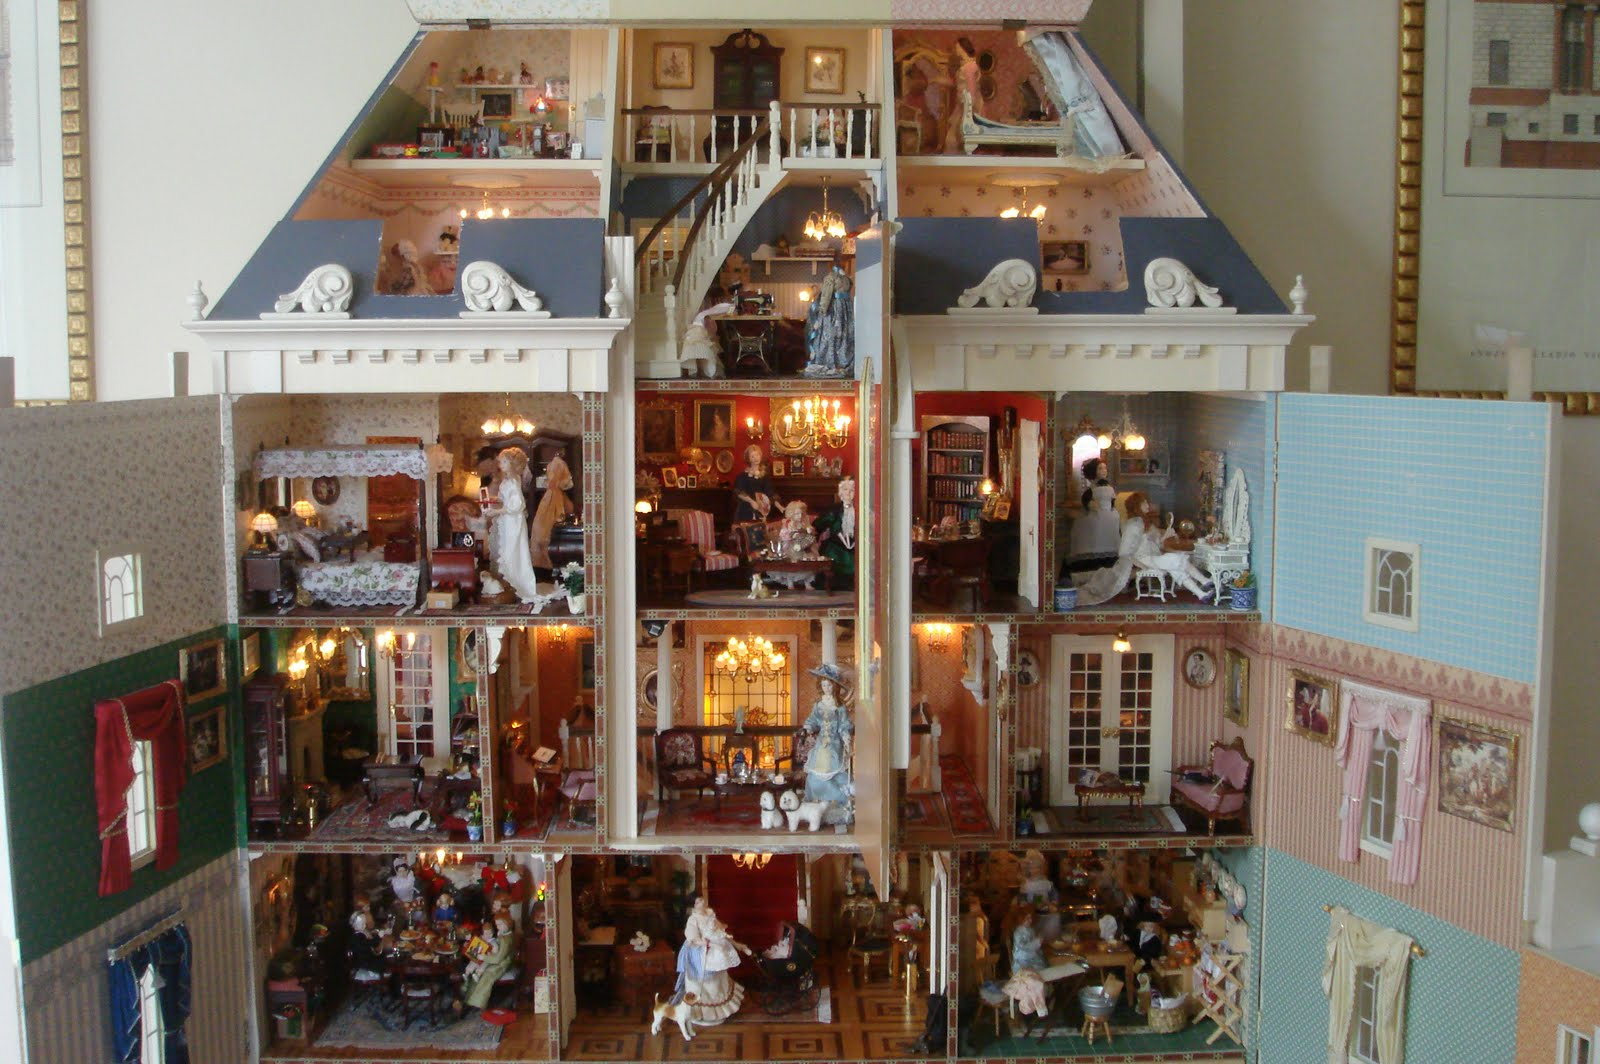 Las minis de belen - Gran casa de munecas playmobil ...